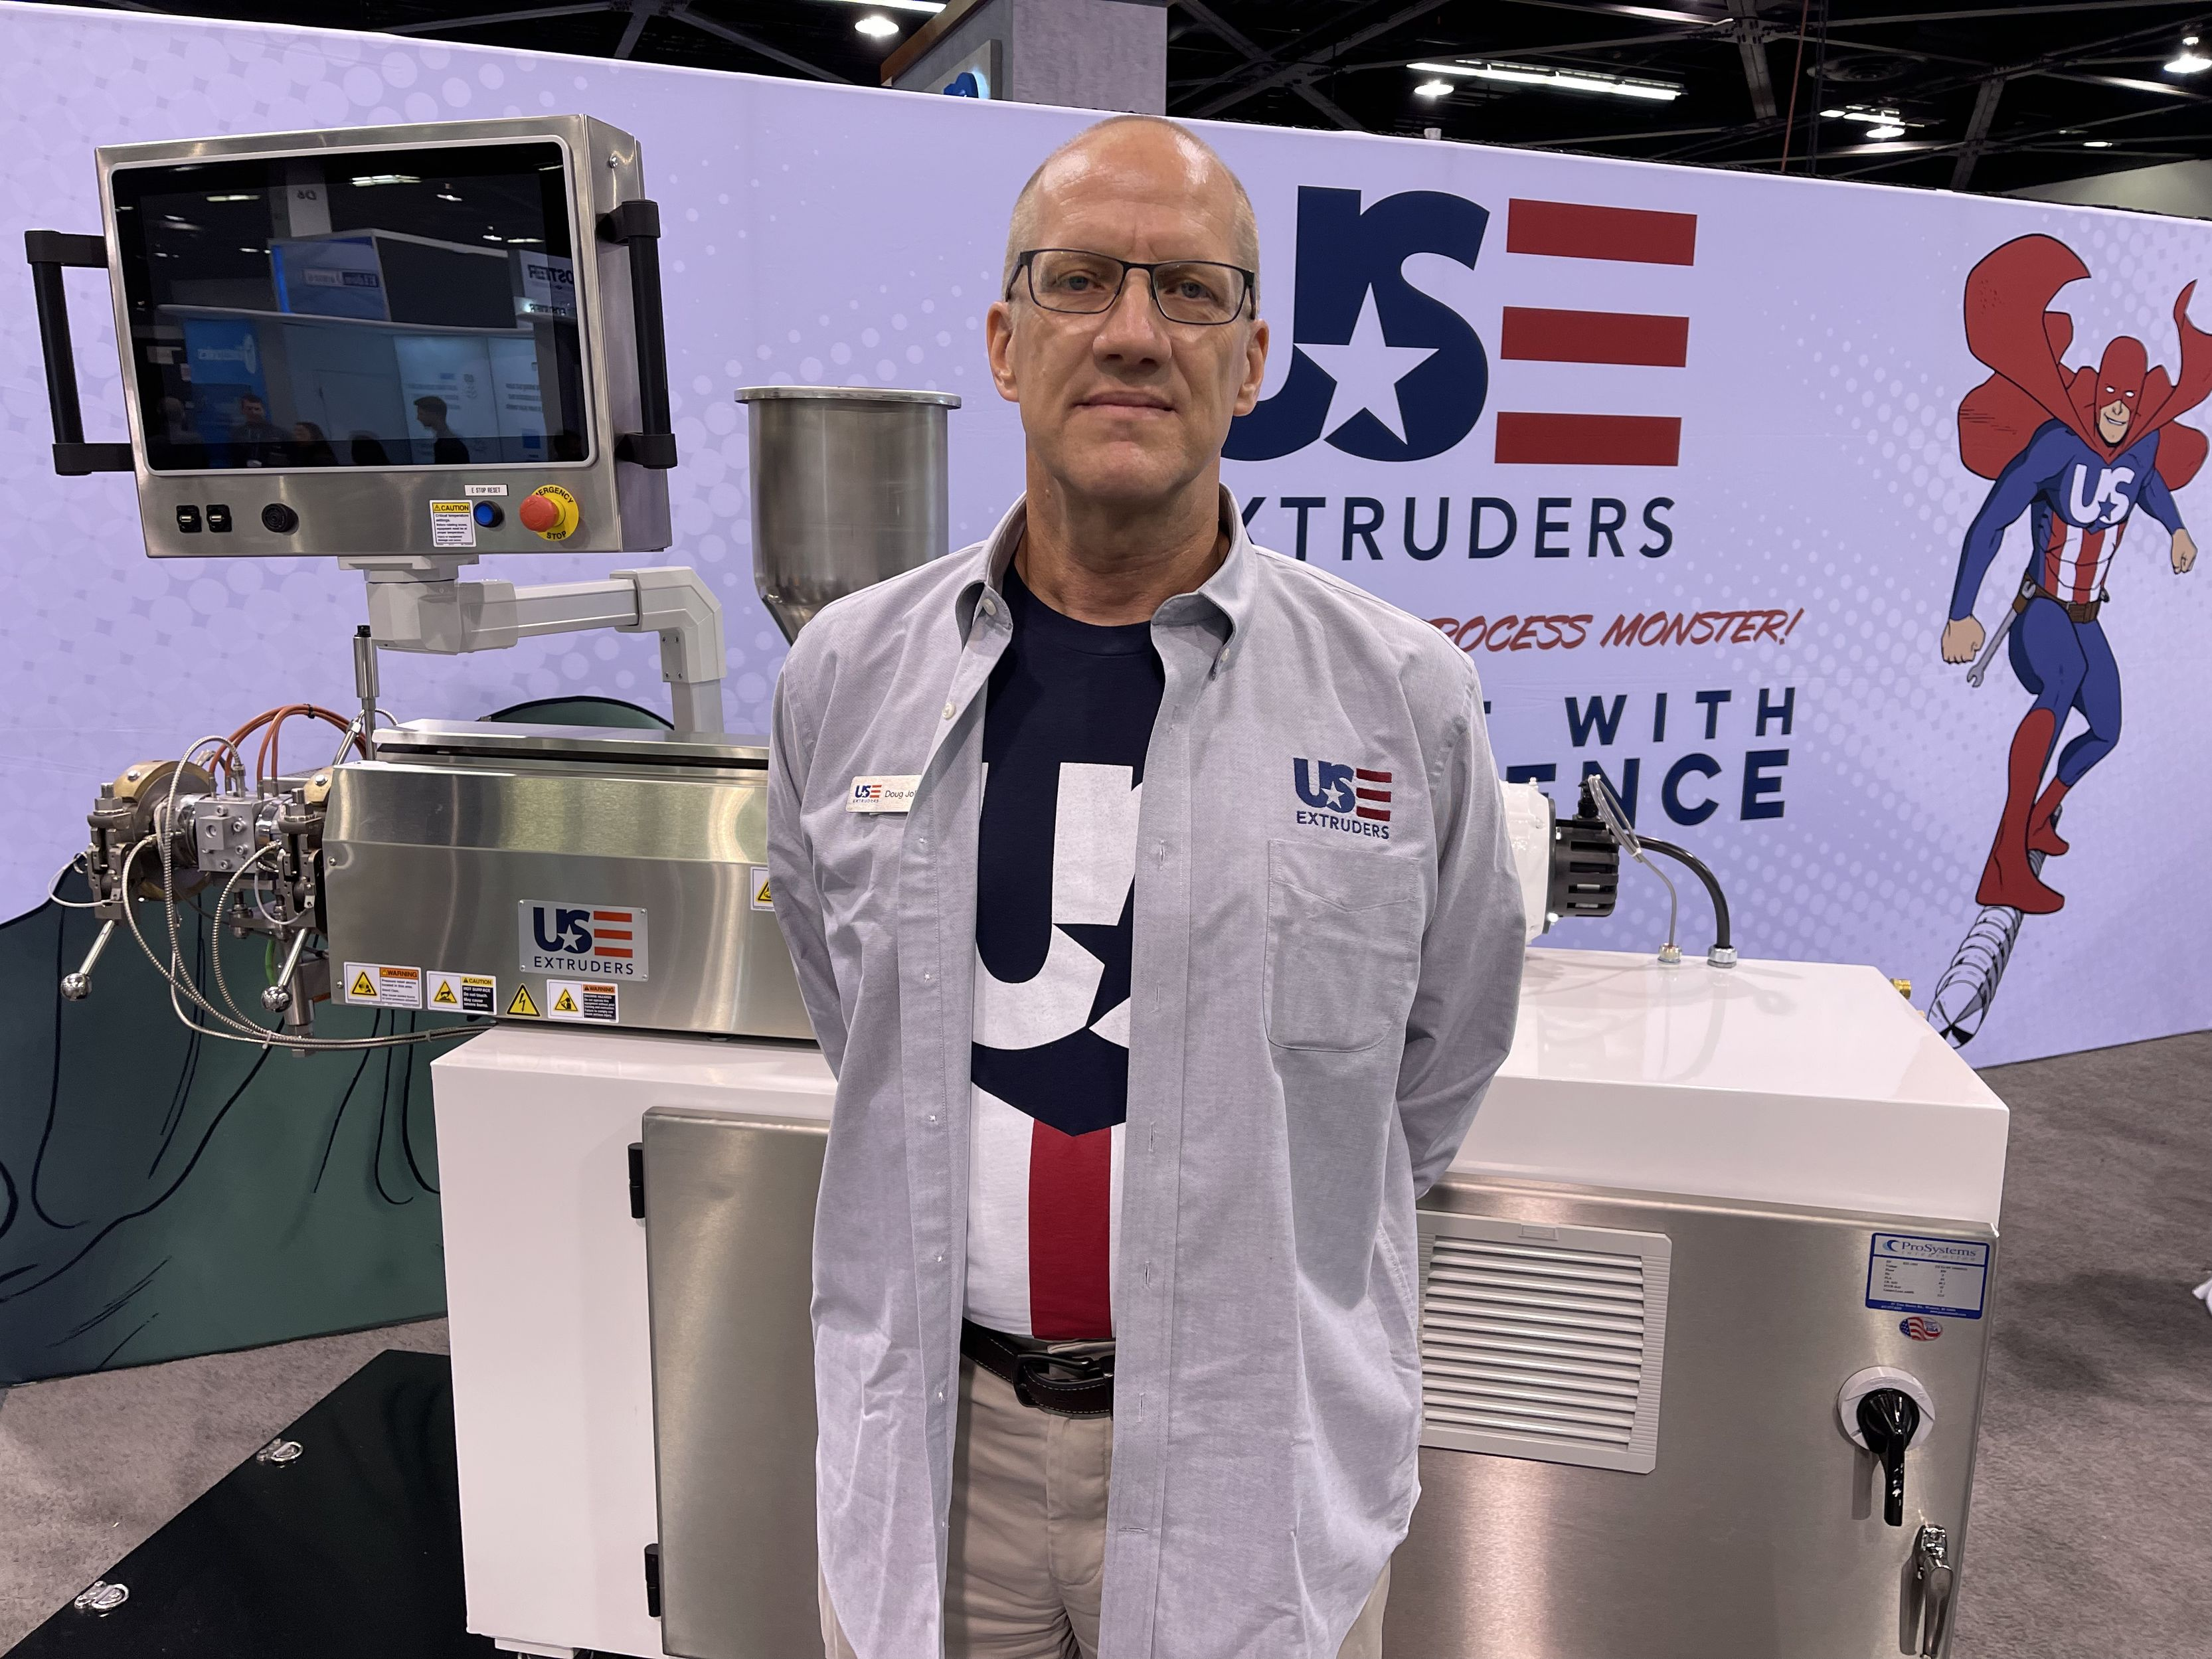 Doug Johnson, U.S. Extruders